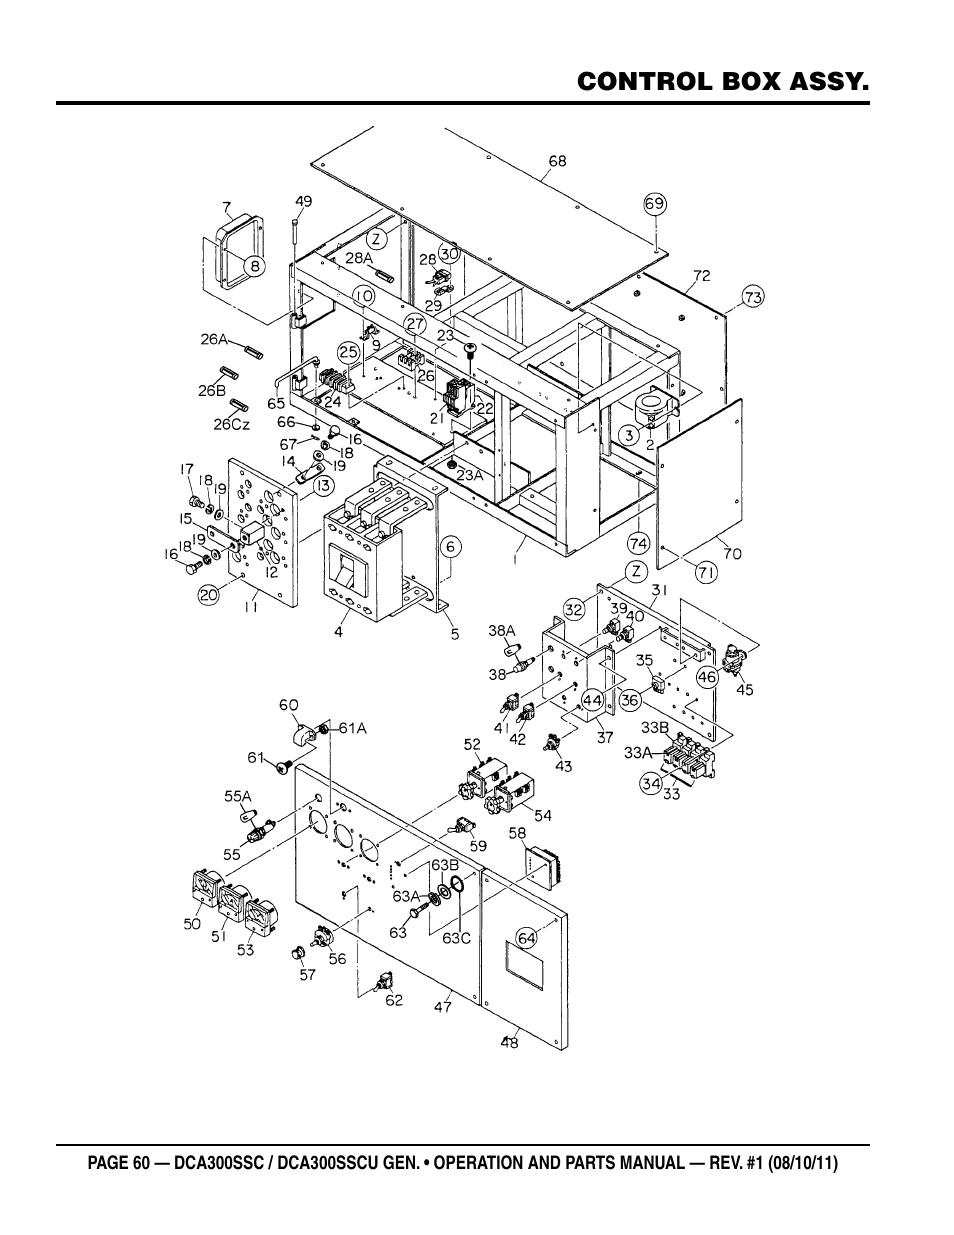 Parts Manual Cummins Engine Qsl Hatz Diagram Multiquip Whisperwatt Series 60hz Generator Qsl9 G3 Diesel Rh Manualsdir Com 89l Qsol